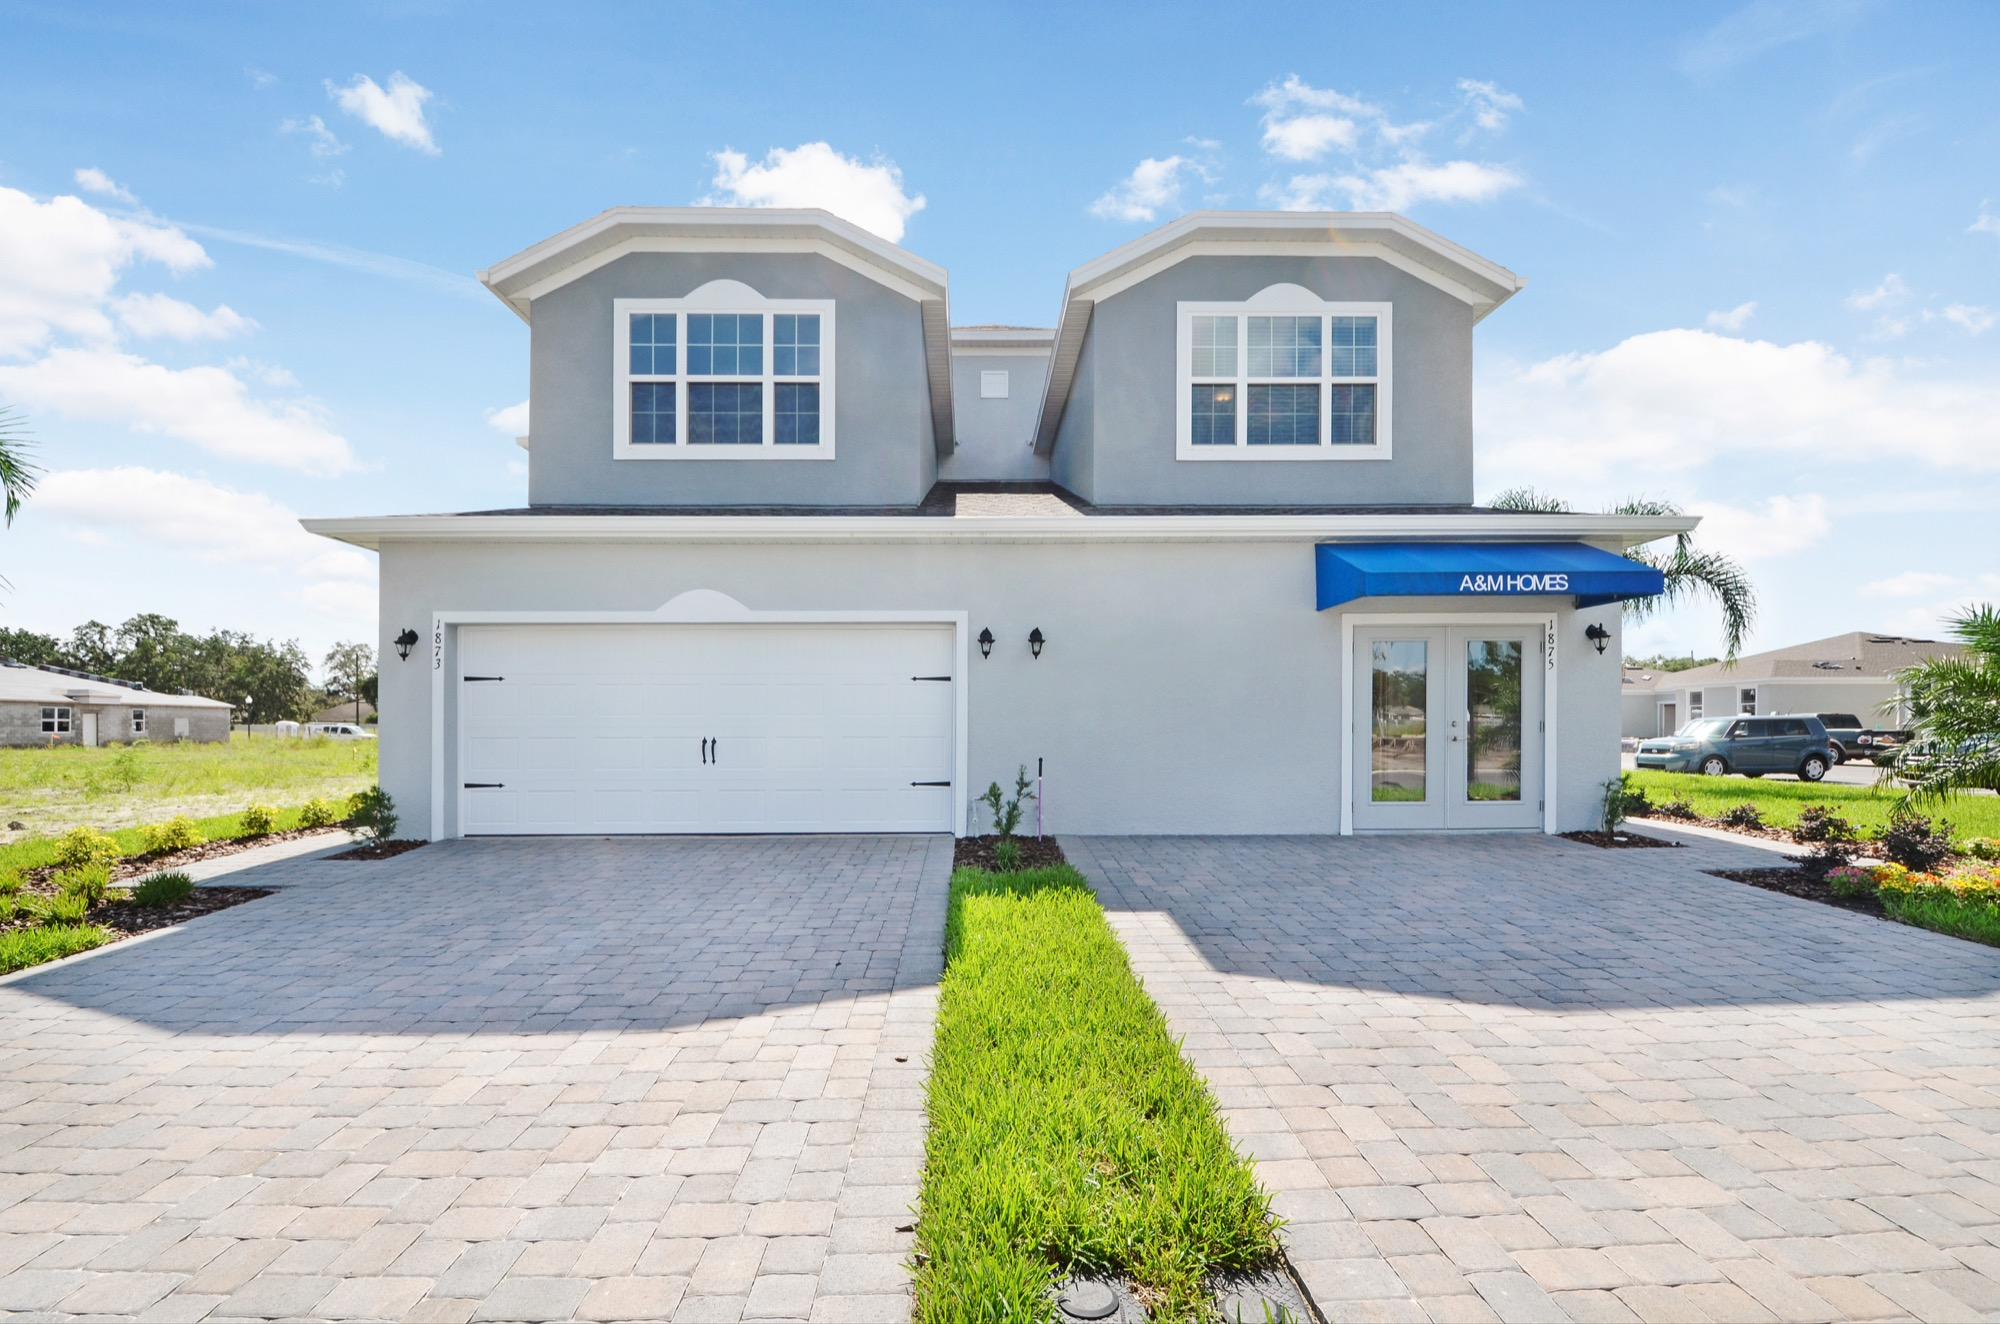 1875 Overcup Ave, St Cloud FL, 34771